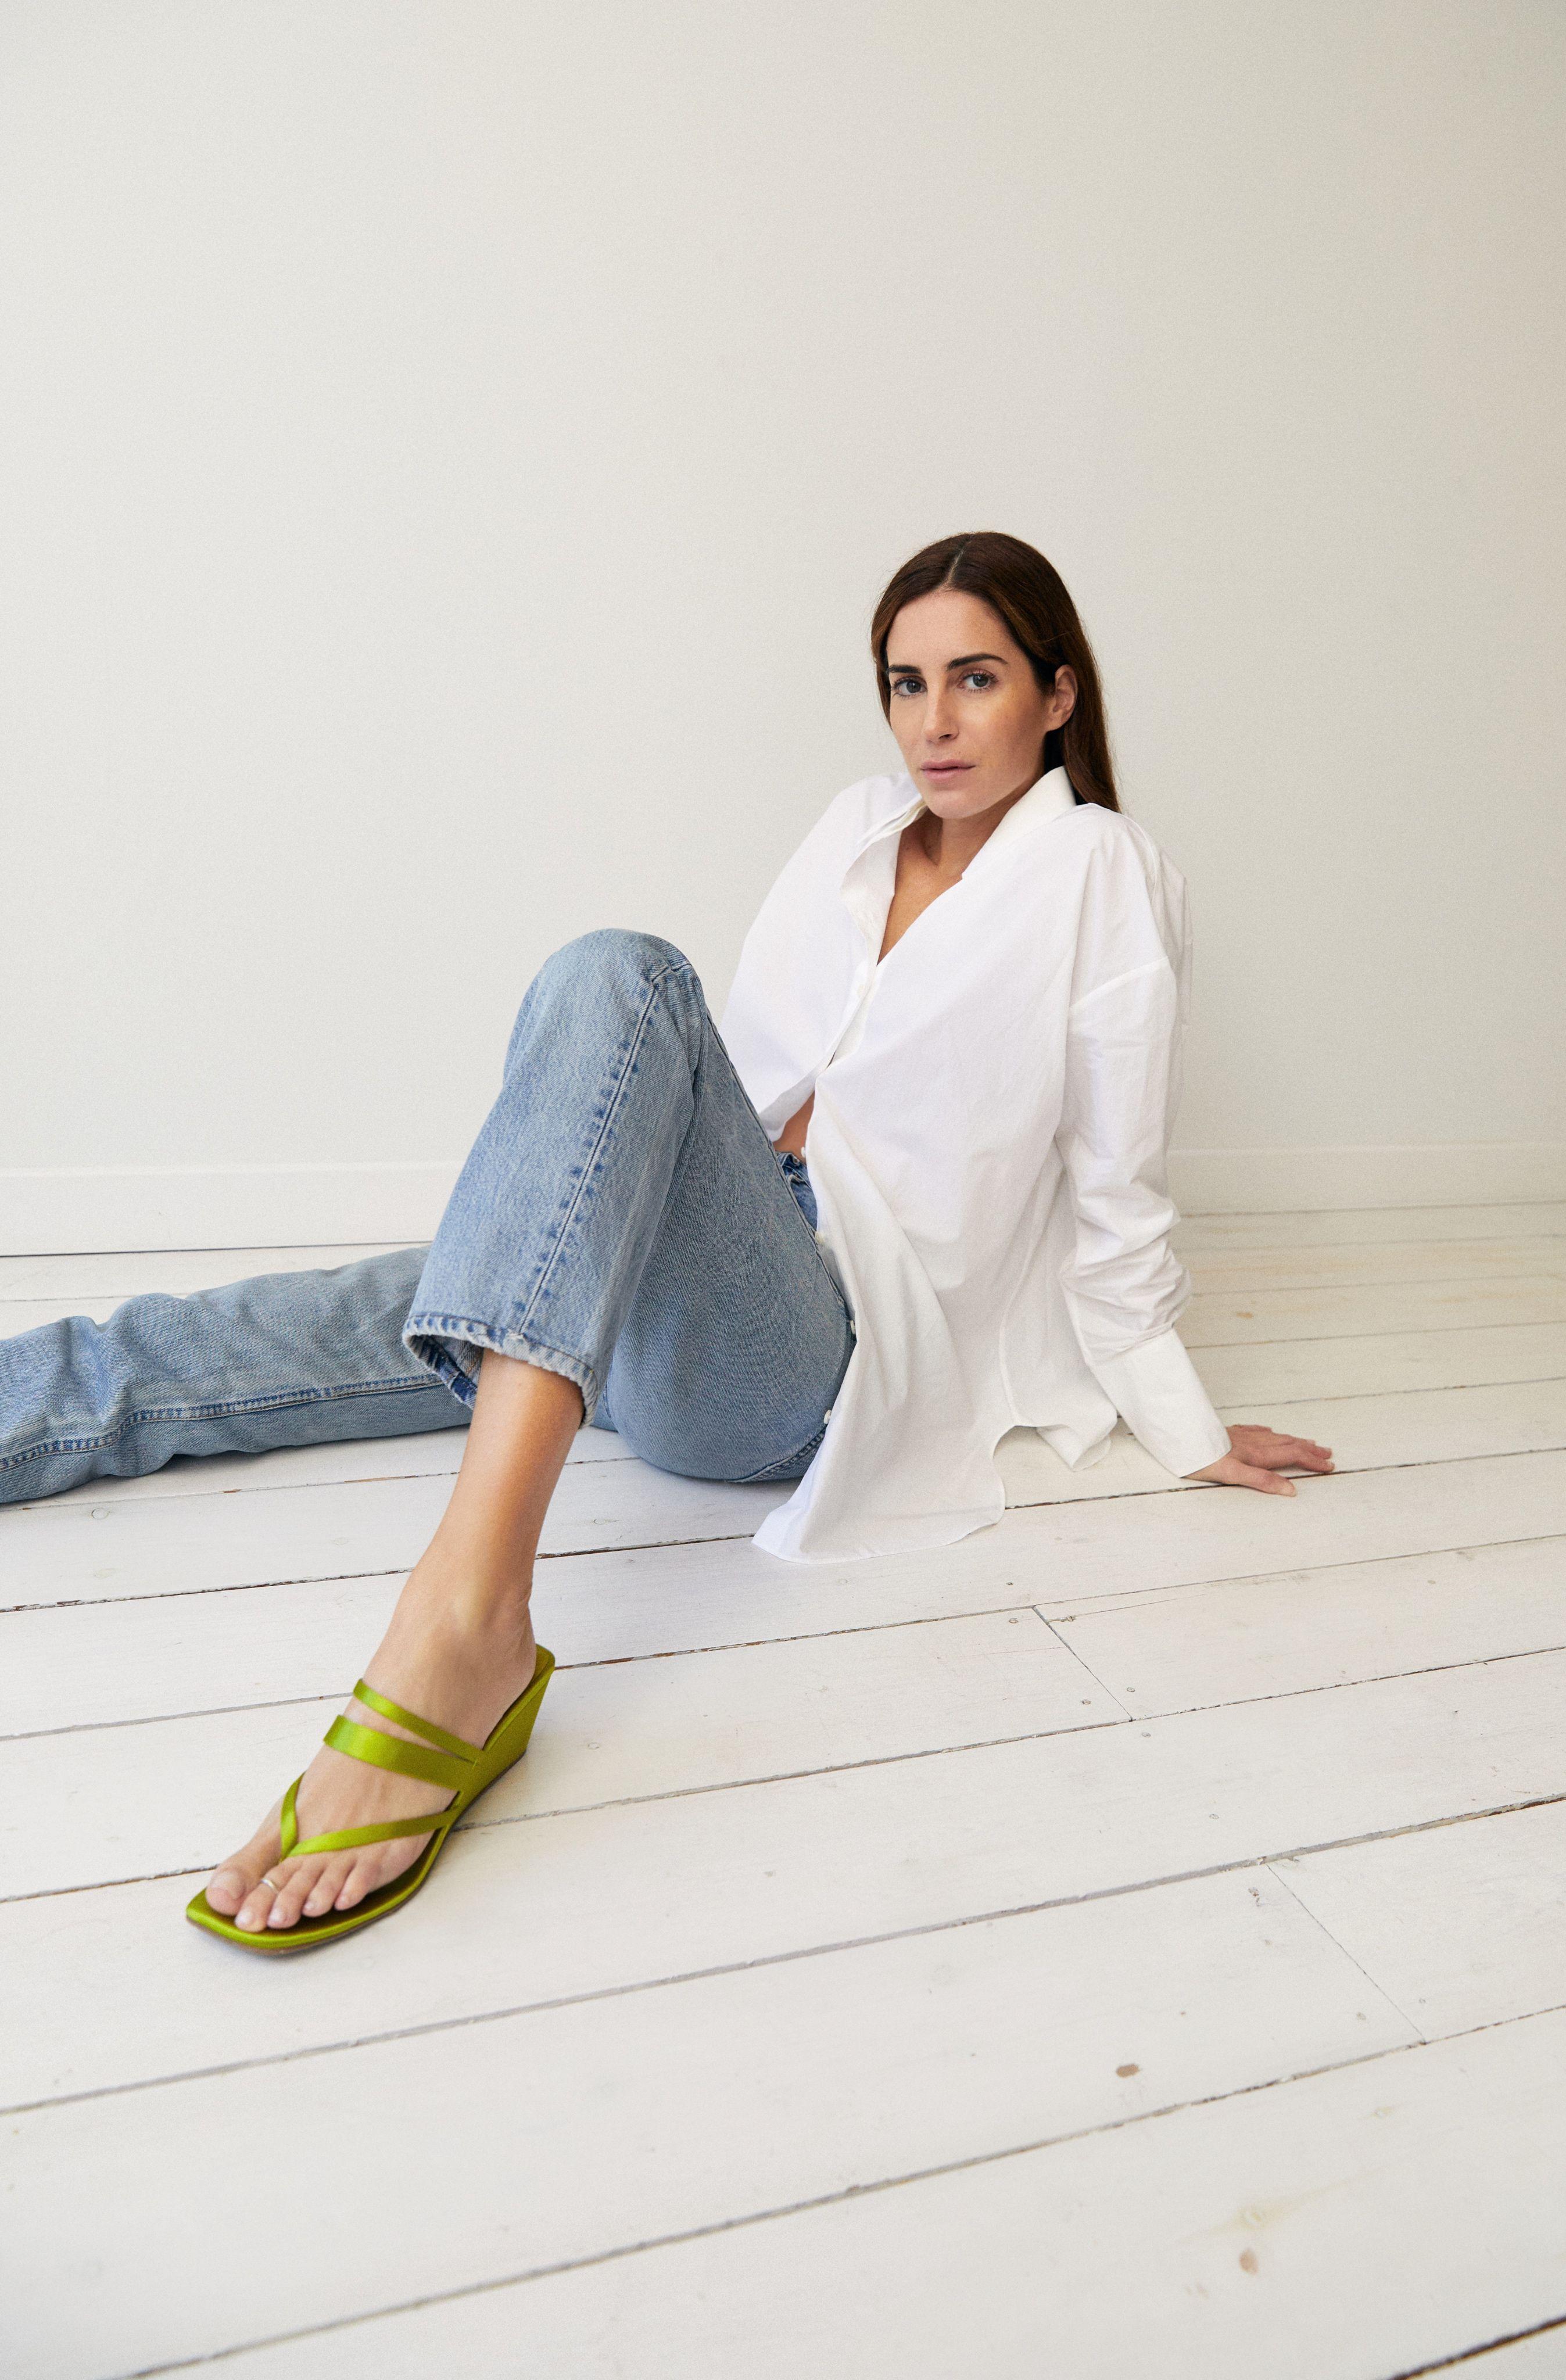 Pedro García x Gala Gonzalez: Τι συμβαίνει όταν μία Influencer αποφασίζει να σχεδιάσει παπούτσια;